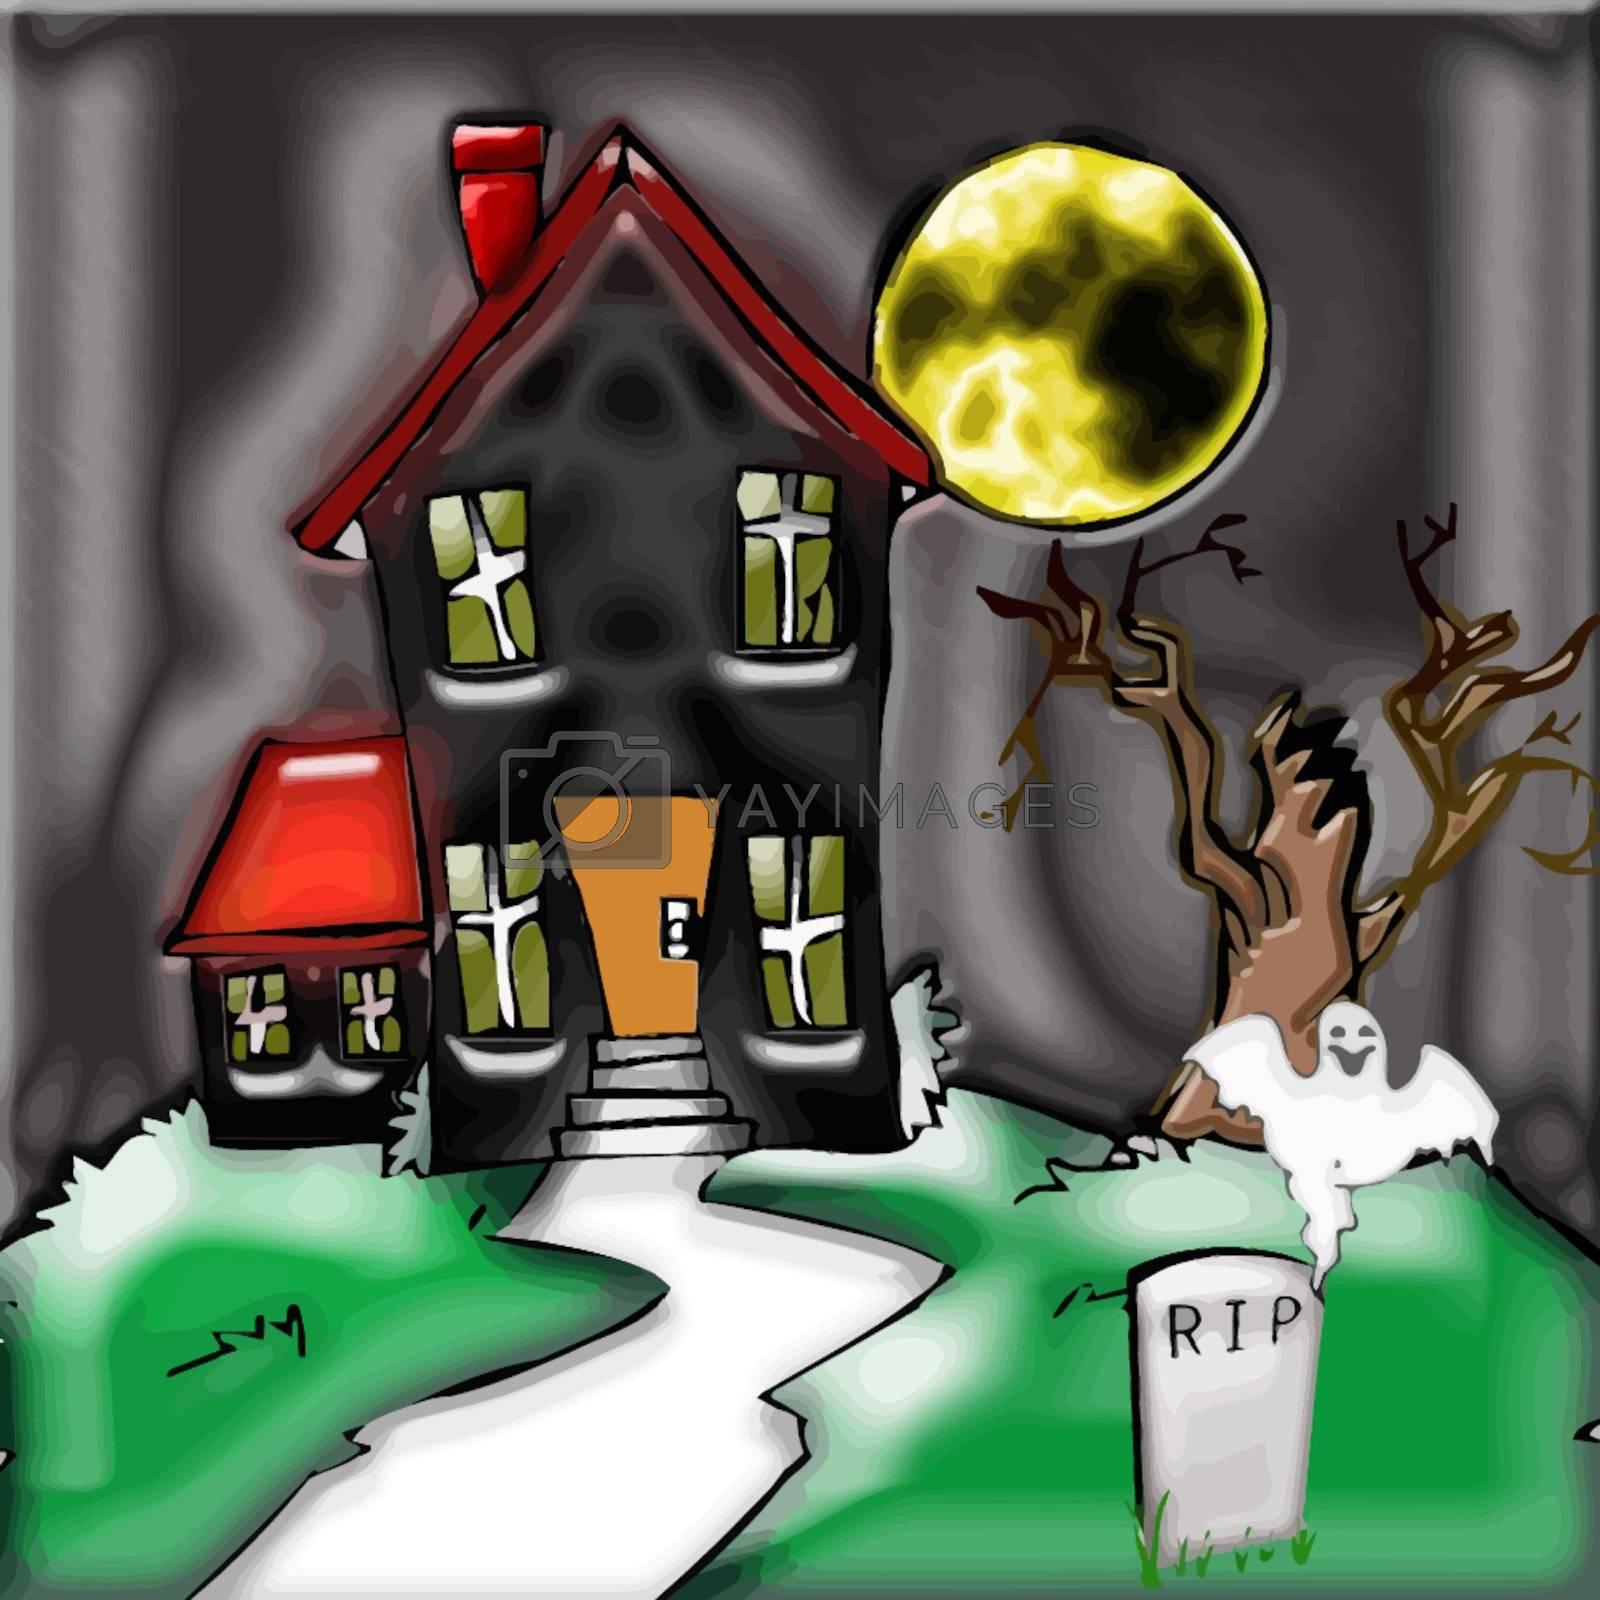 a spooky haunted house for the halloween season